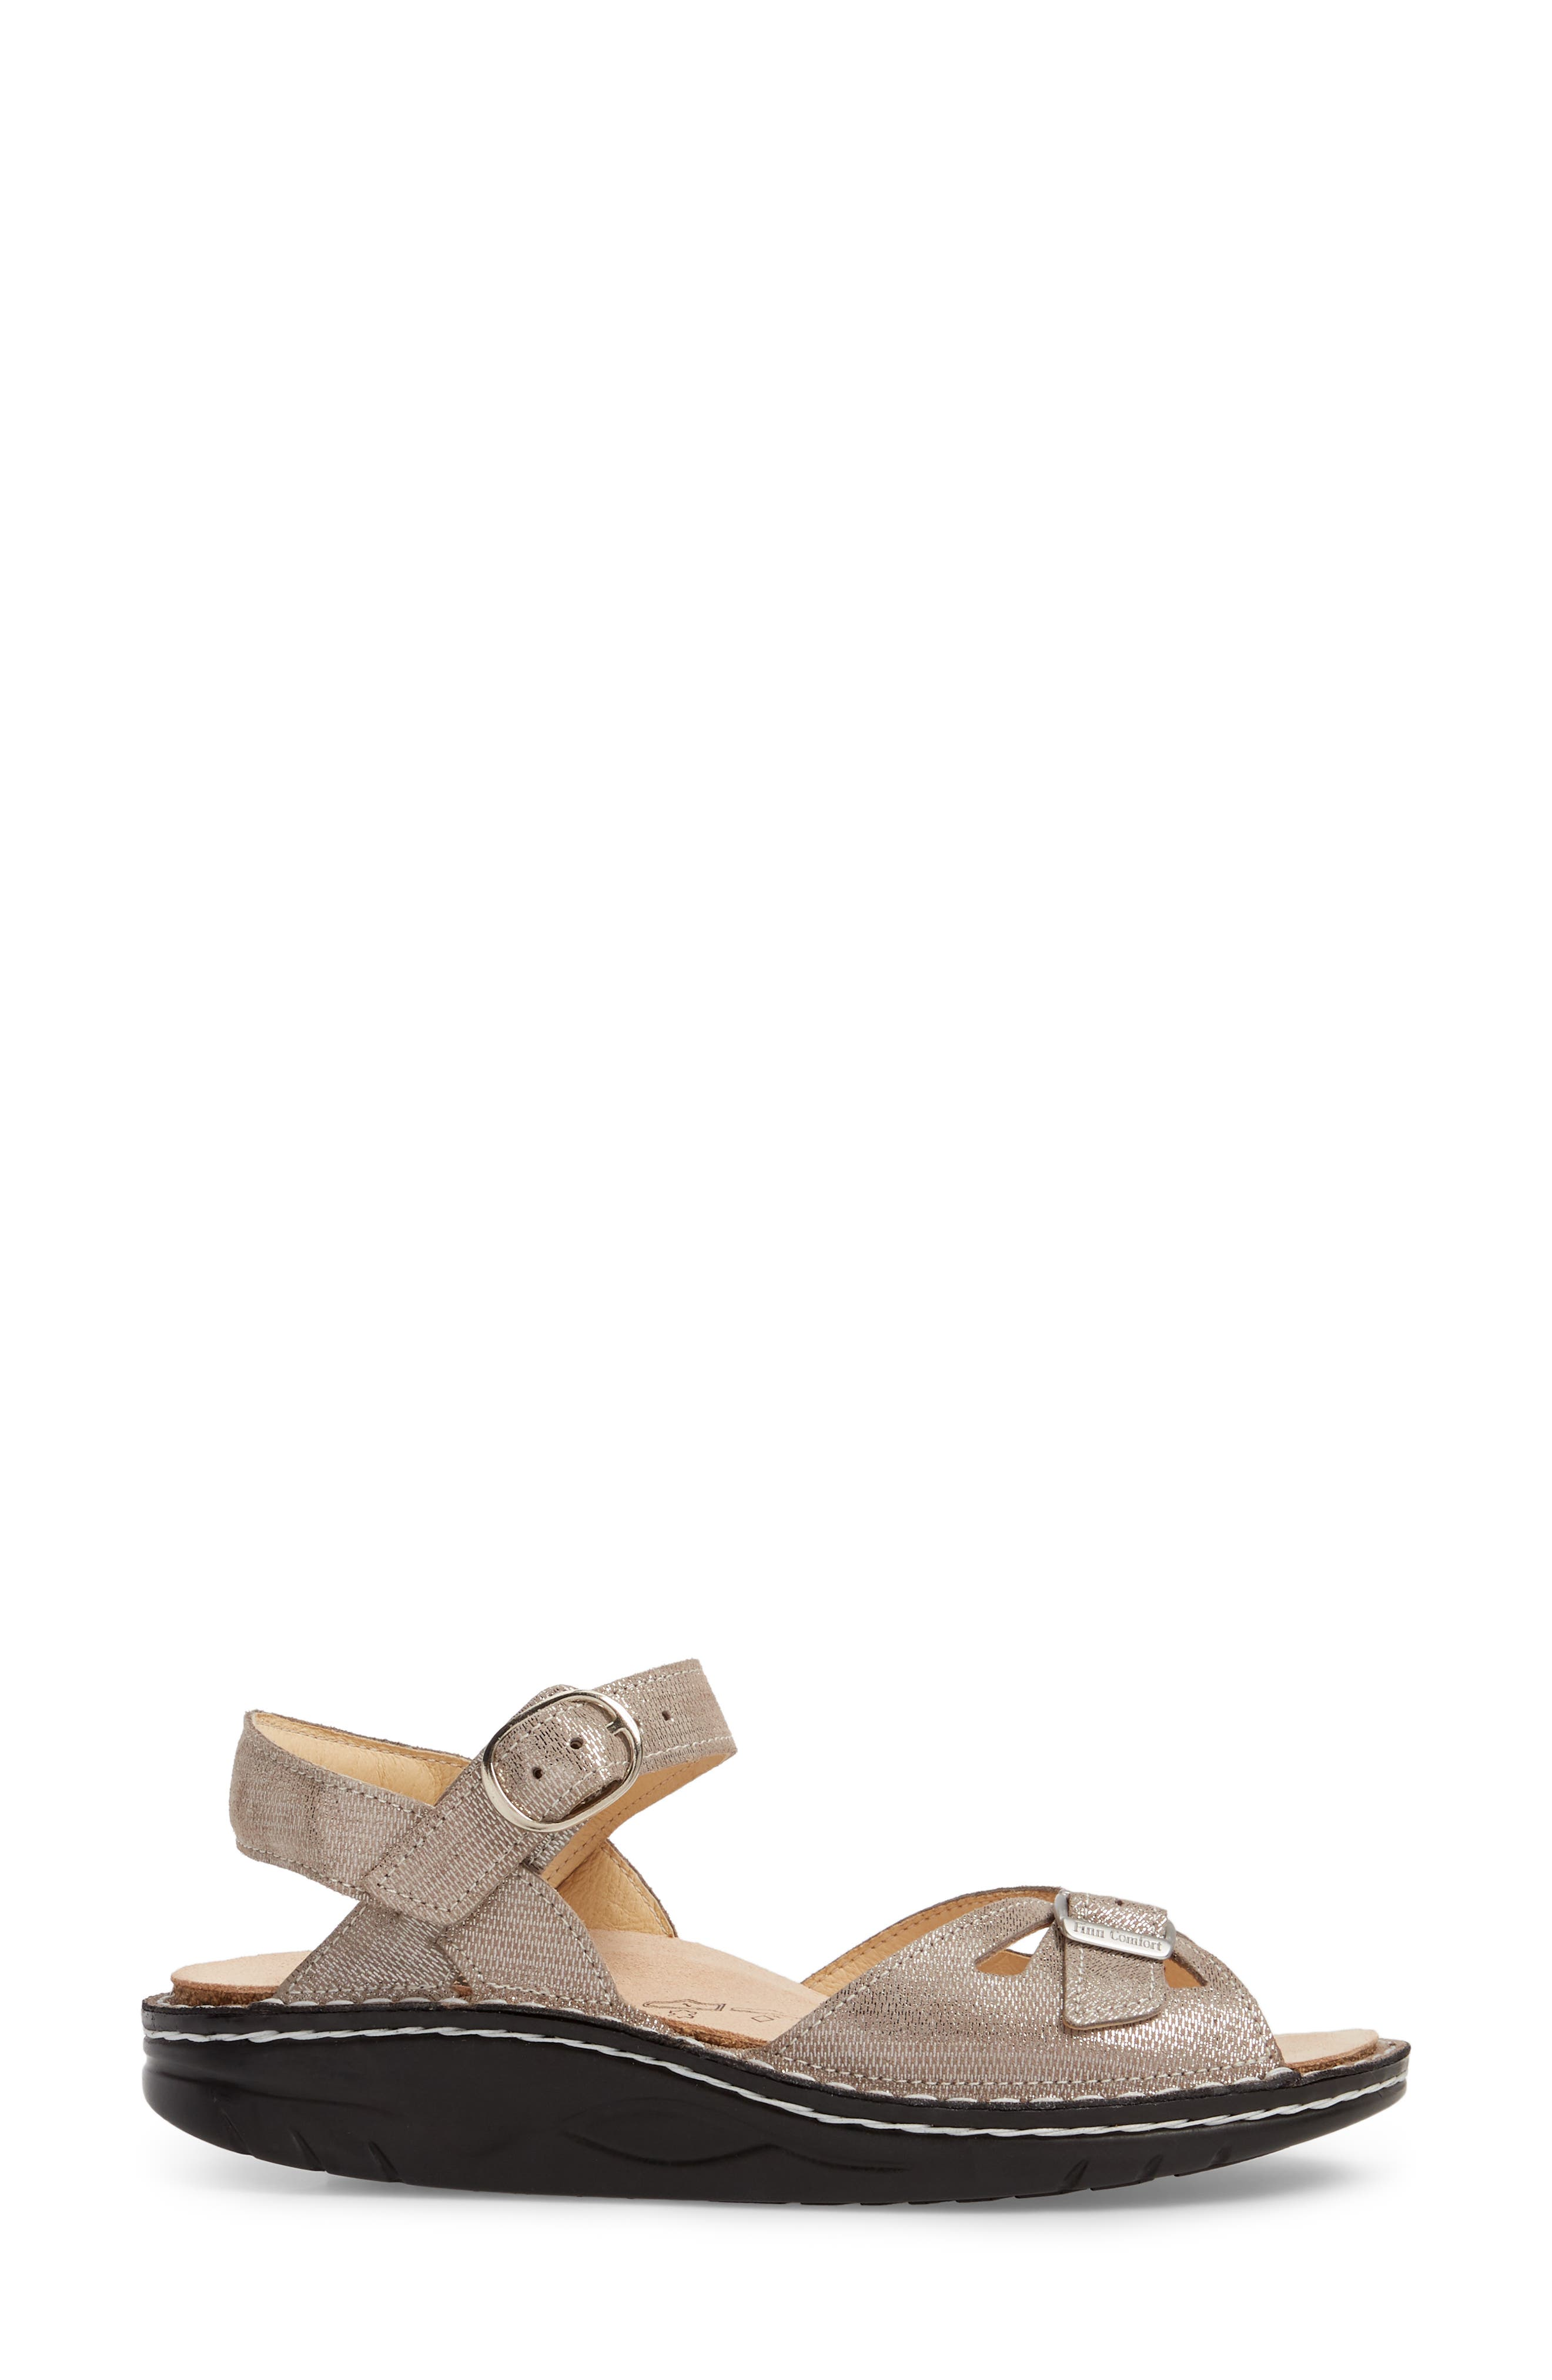 Motomachi Sandal,                             Alternate thumbnail 3, color,                             Fango Leather